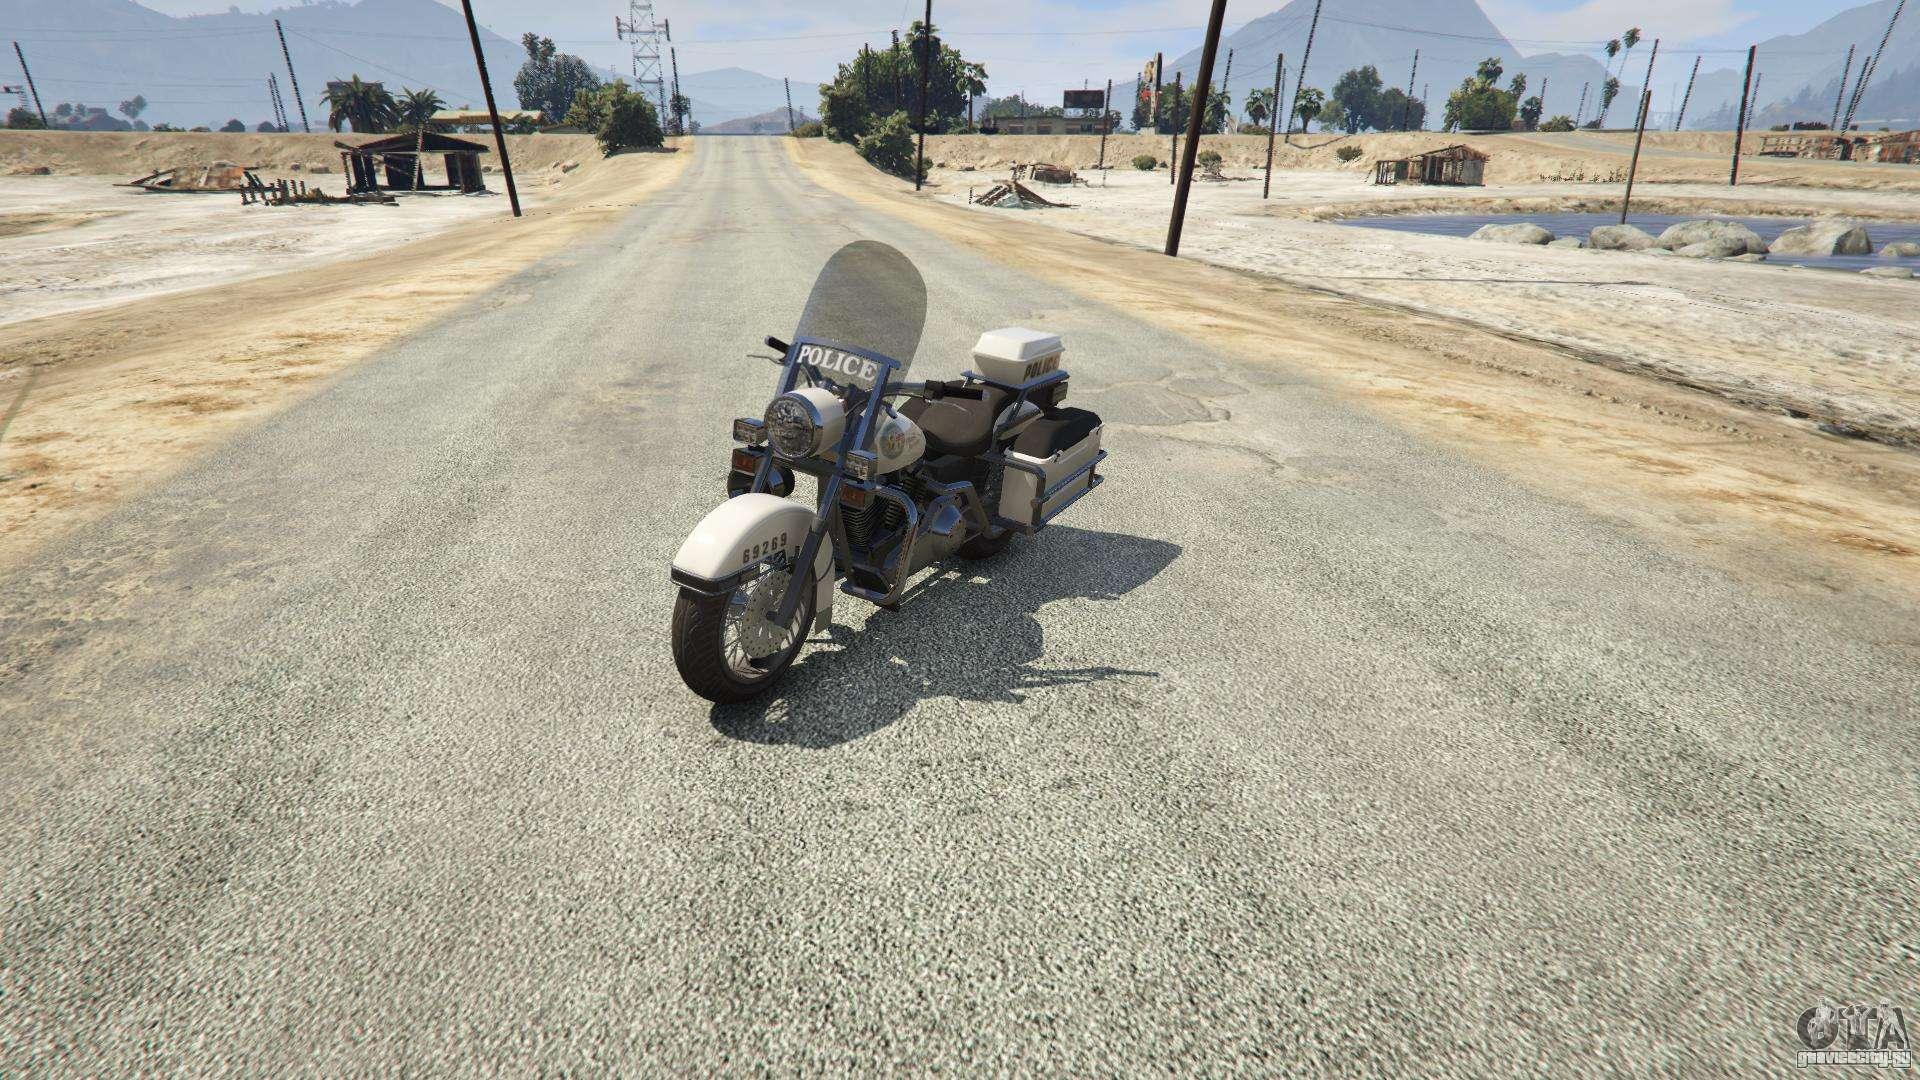 Полицейский мотоцикл из GTA 5 - вид спереди